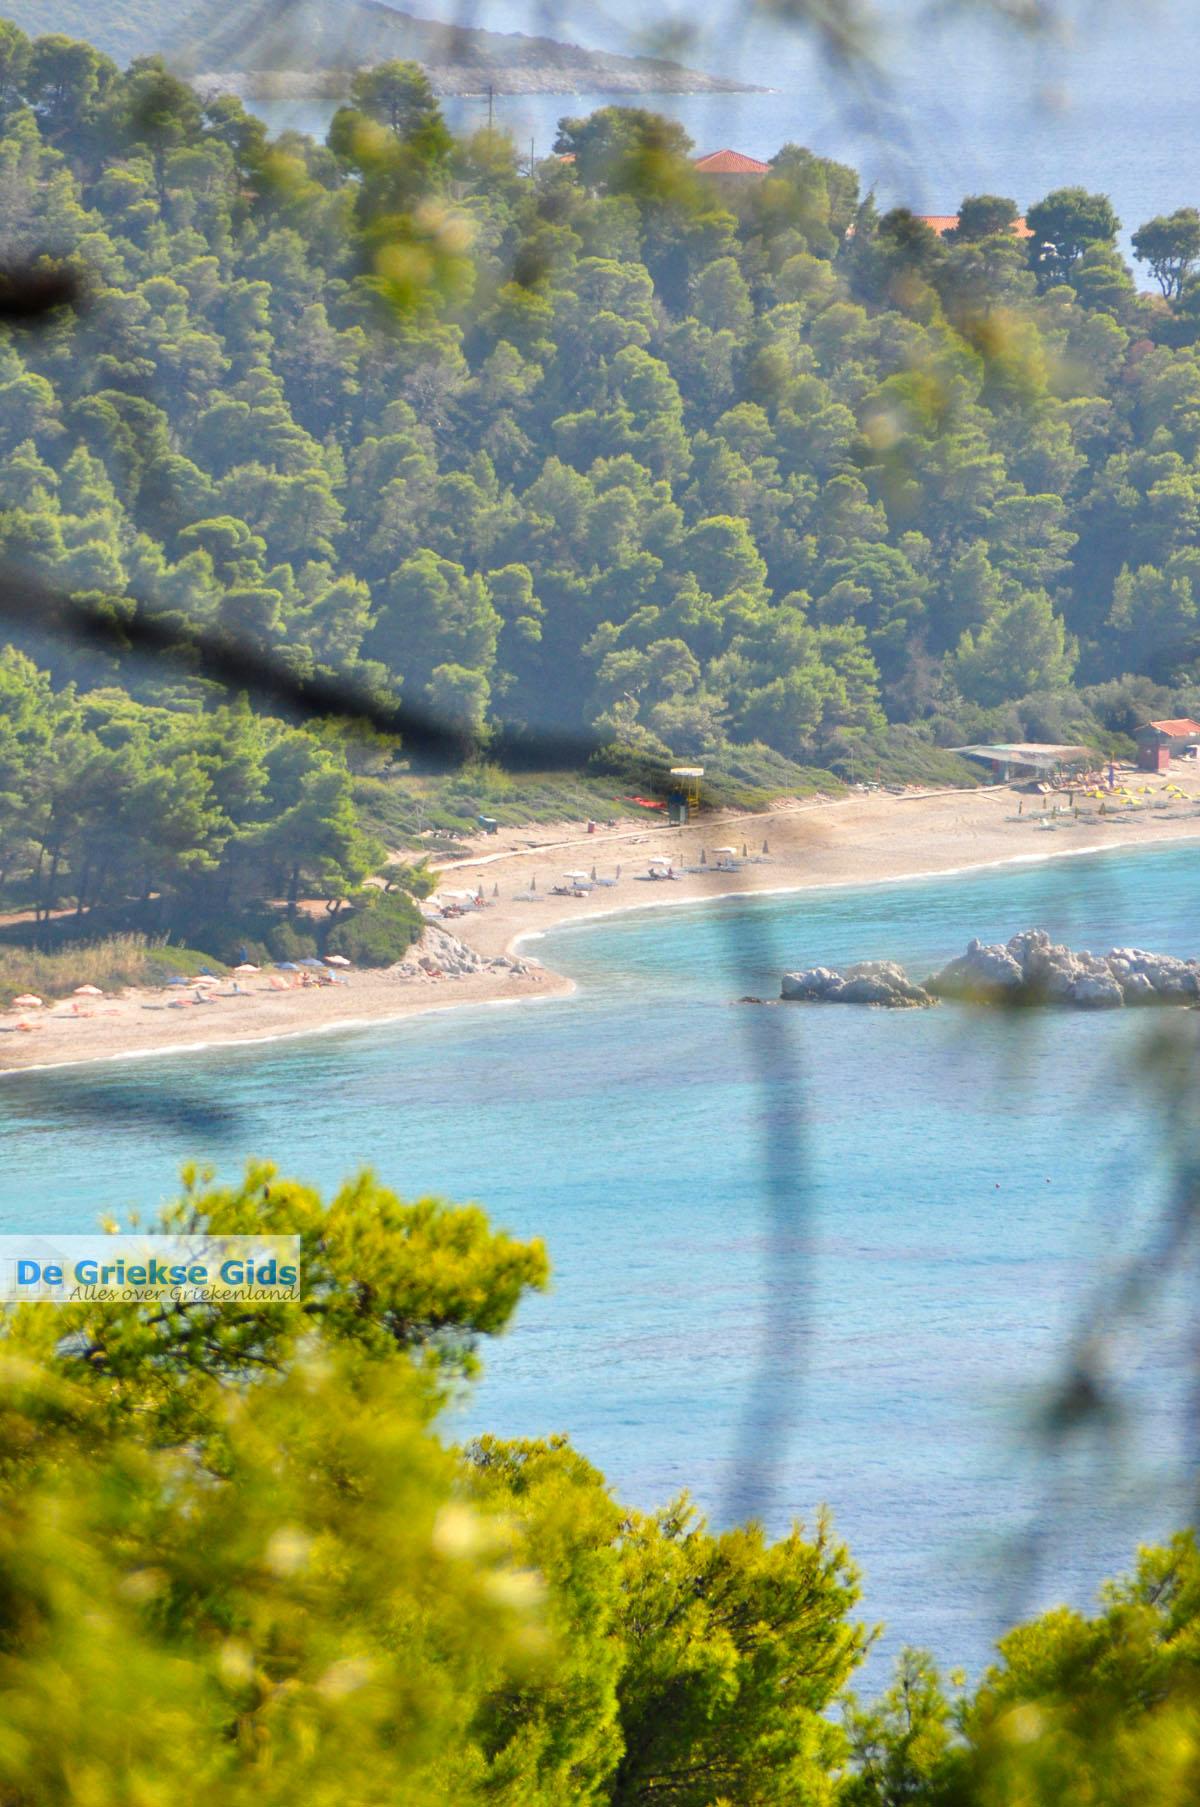 foto Bij de stranden Kastani en Milia   Skopelos Sporaden   De griekse Gids foto 2